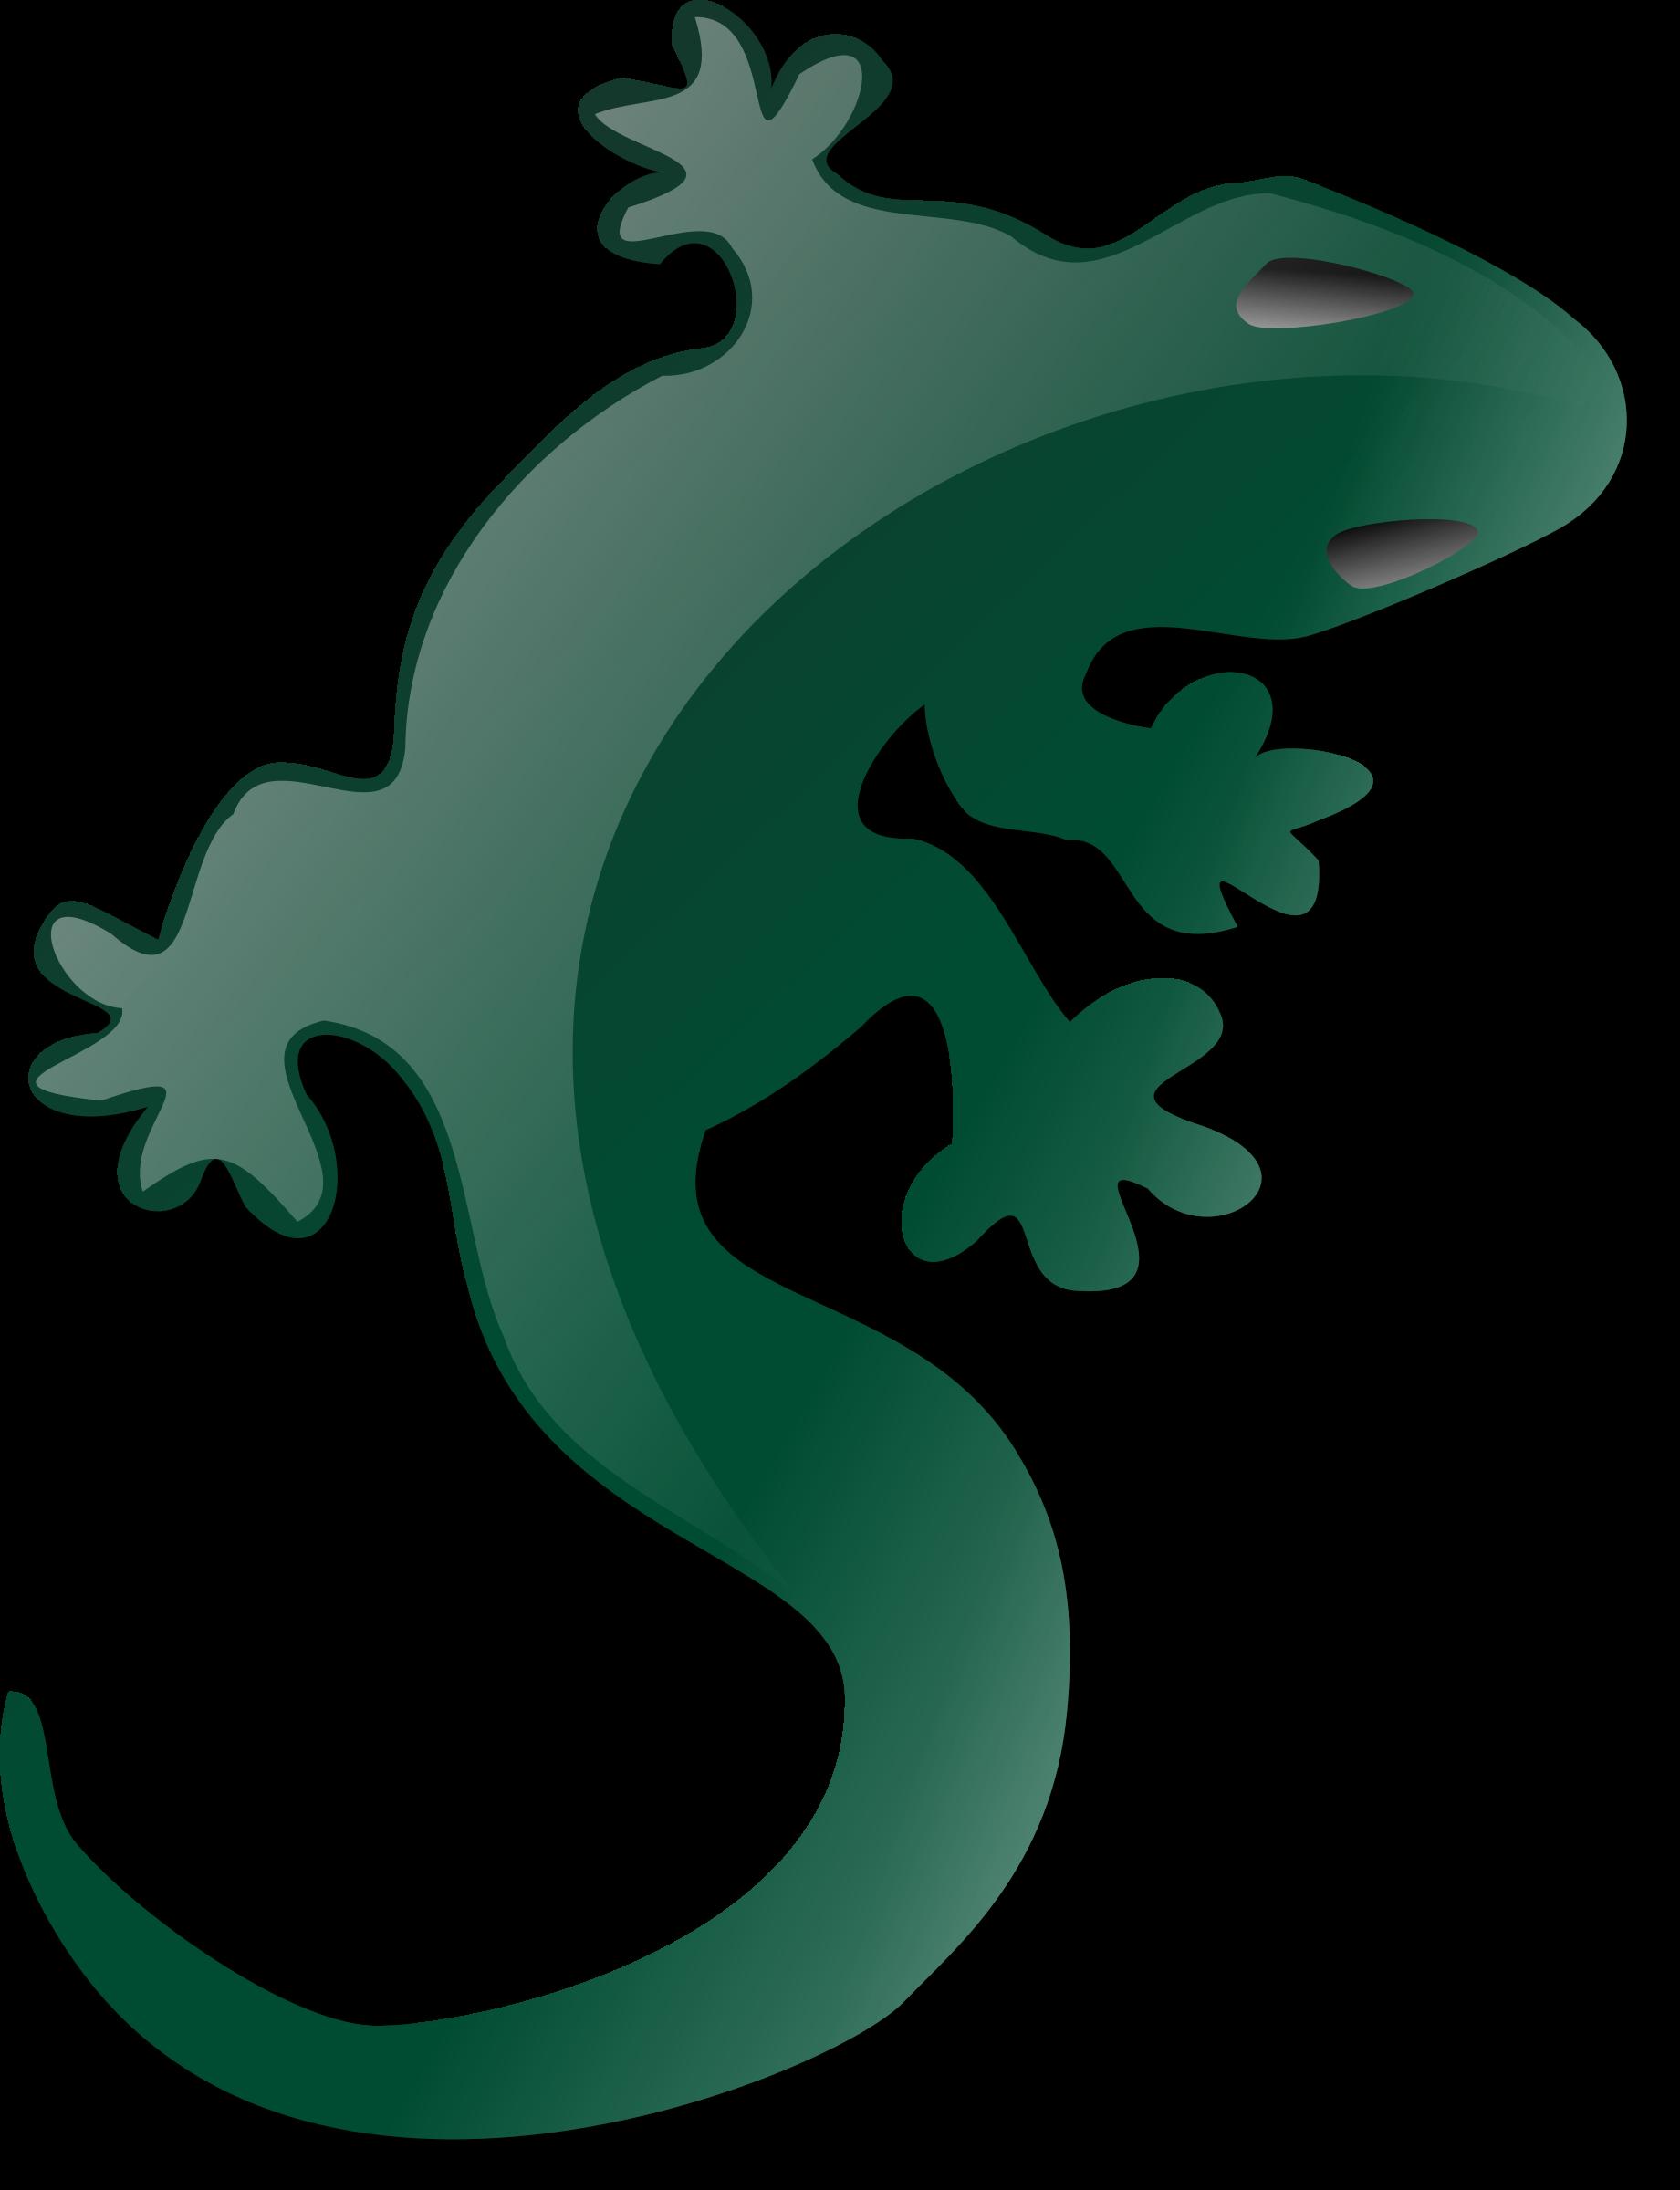 Lizard big image png. Gecko clipart chipkali